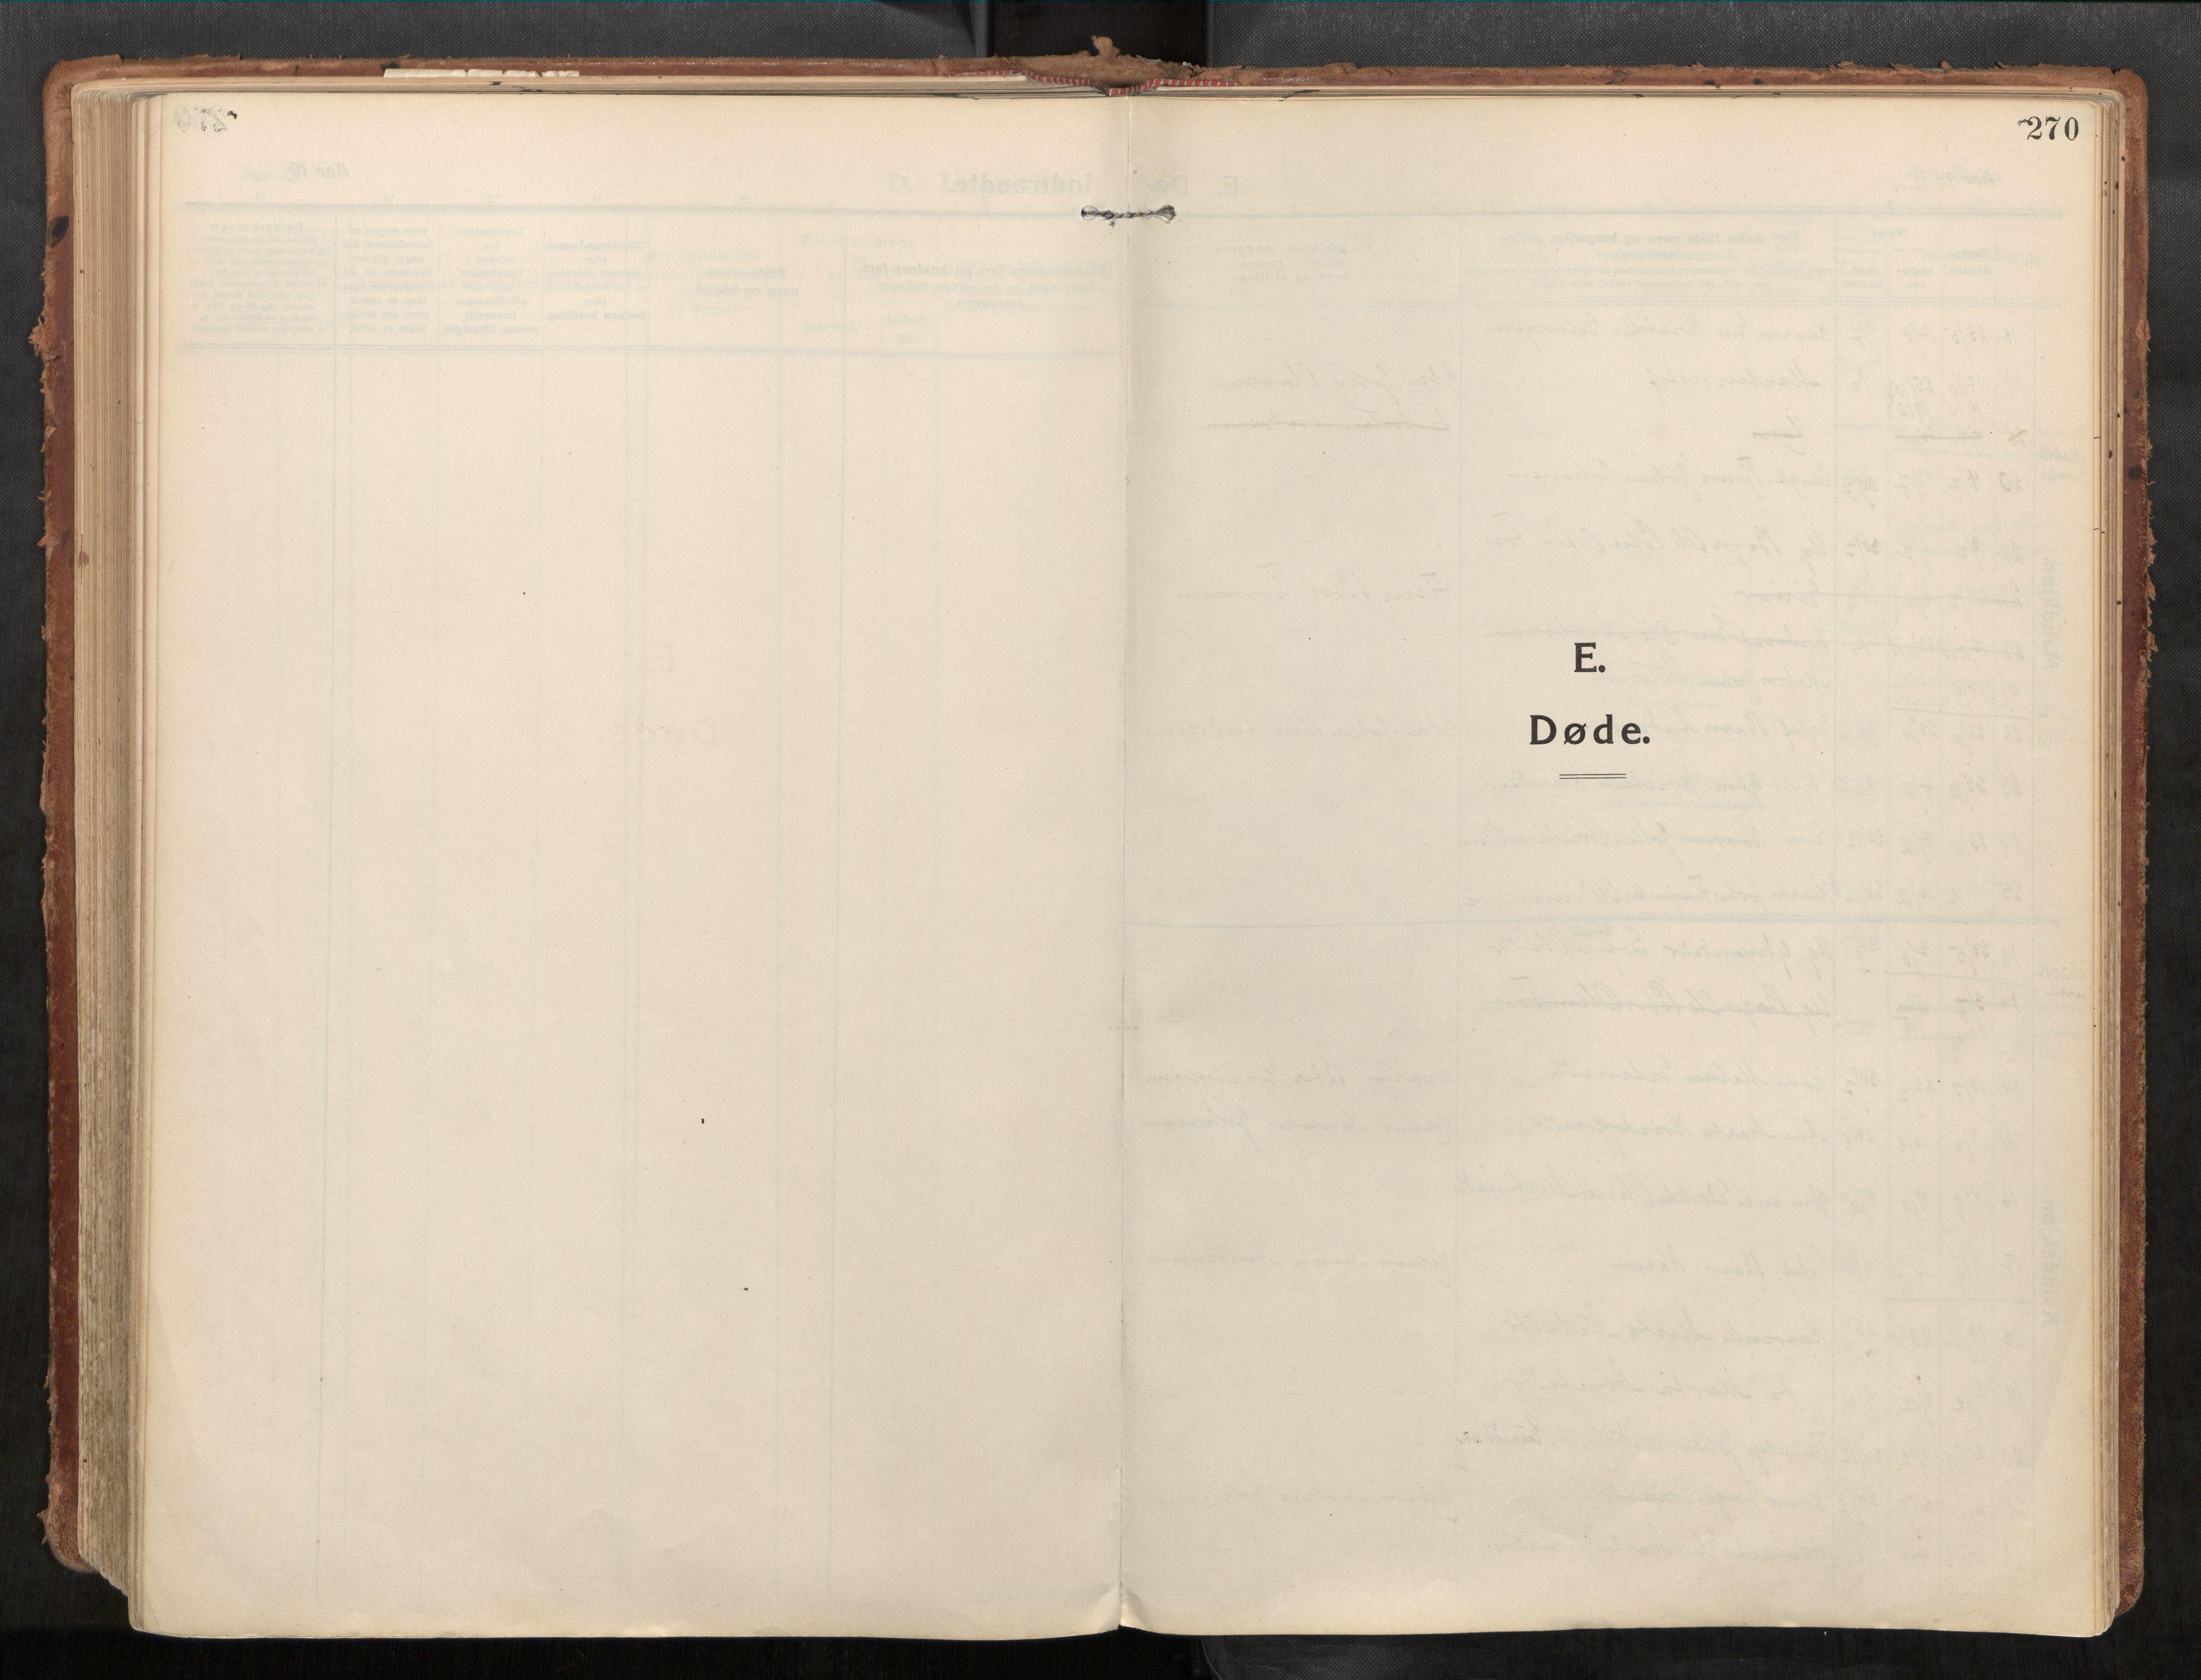 SAT, Stadsbygd sokneprestkontor, I/I1/I1a/L0001: Parish register (official) no. 1, 1911-1929, p. 270